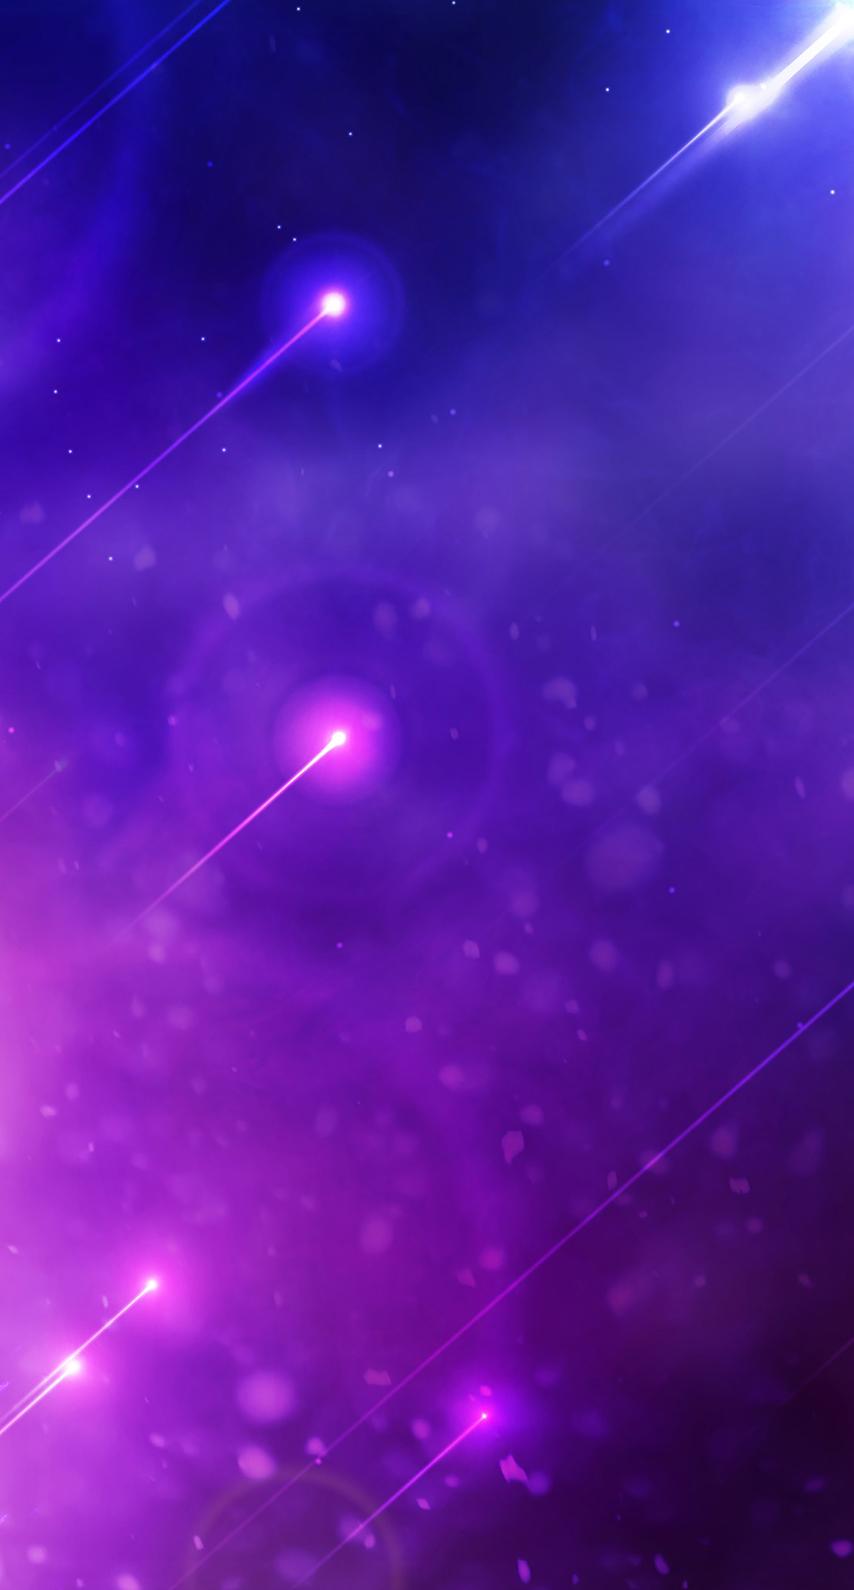 galaxy, bright, fantasy, insubstantial, blur, science, astronomy